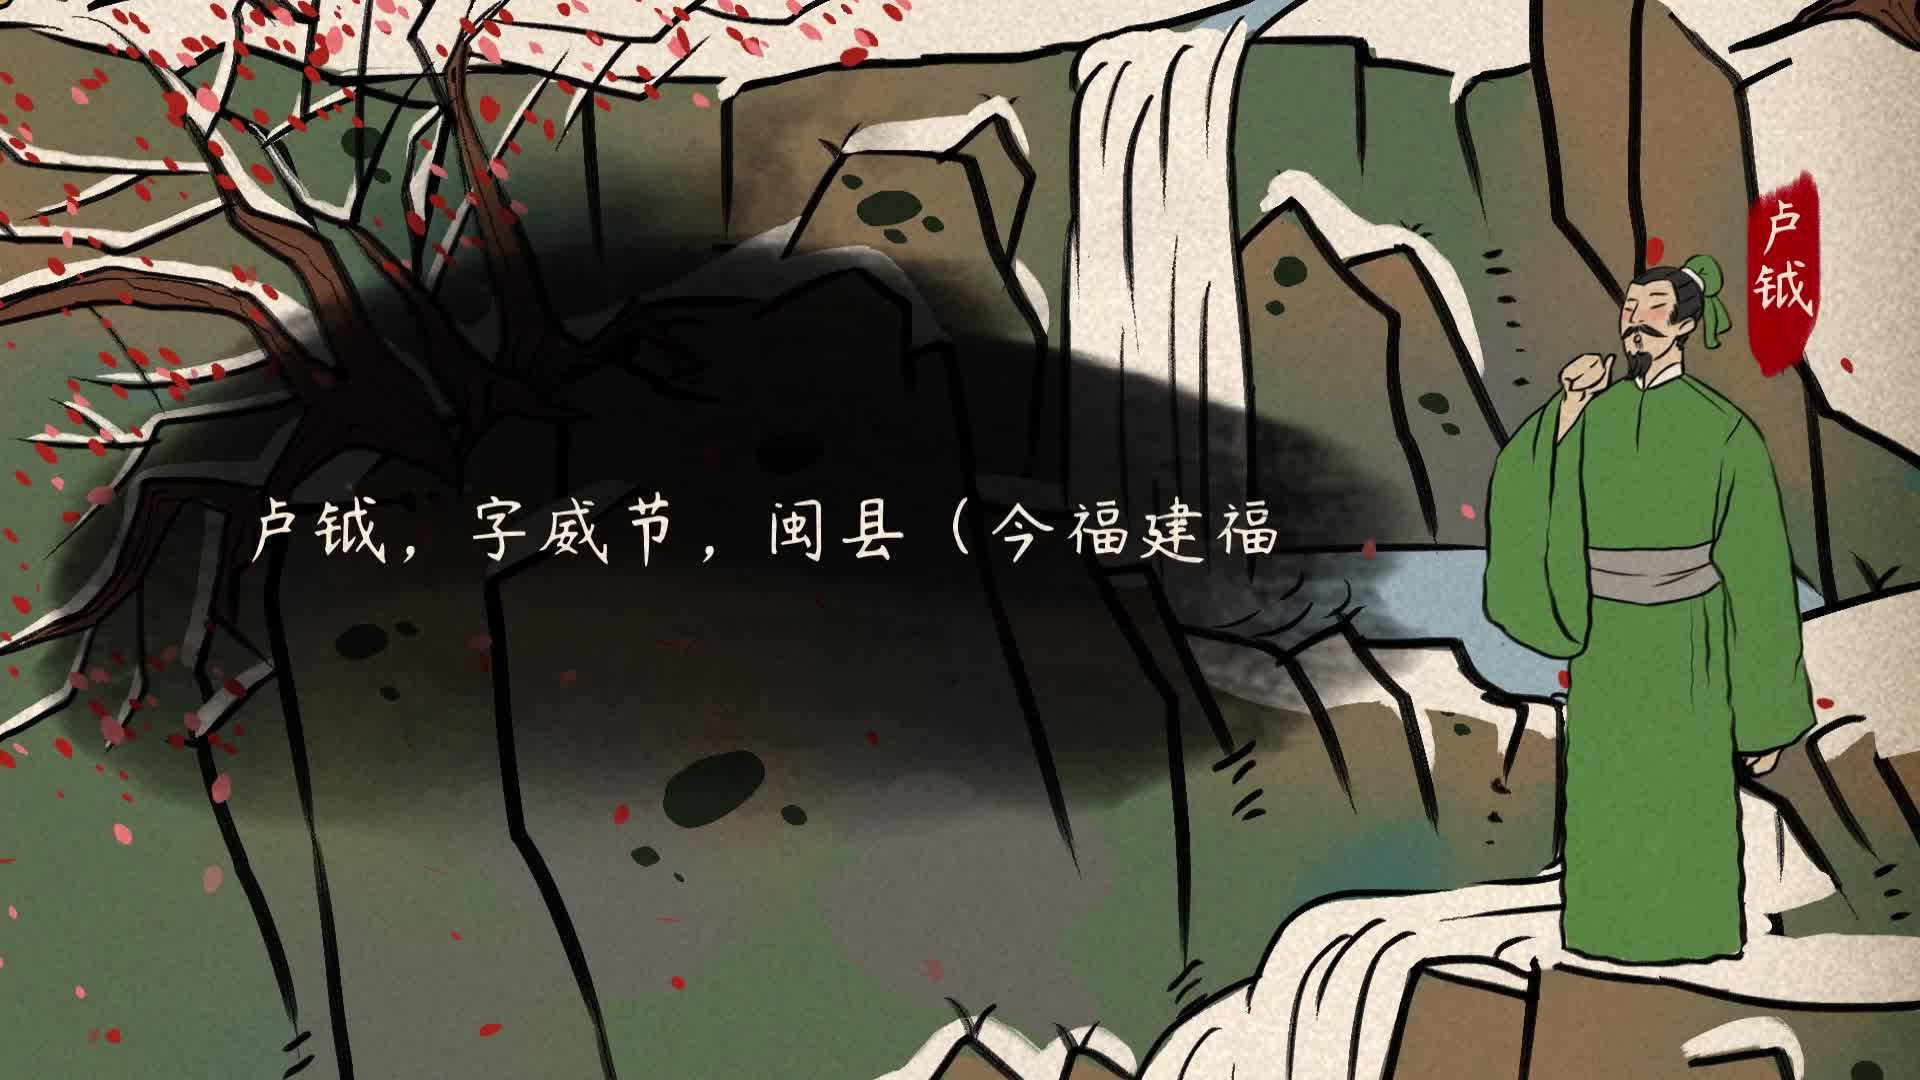 51雪梅-宋 卢钺